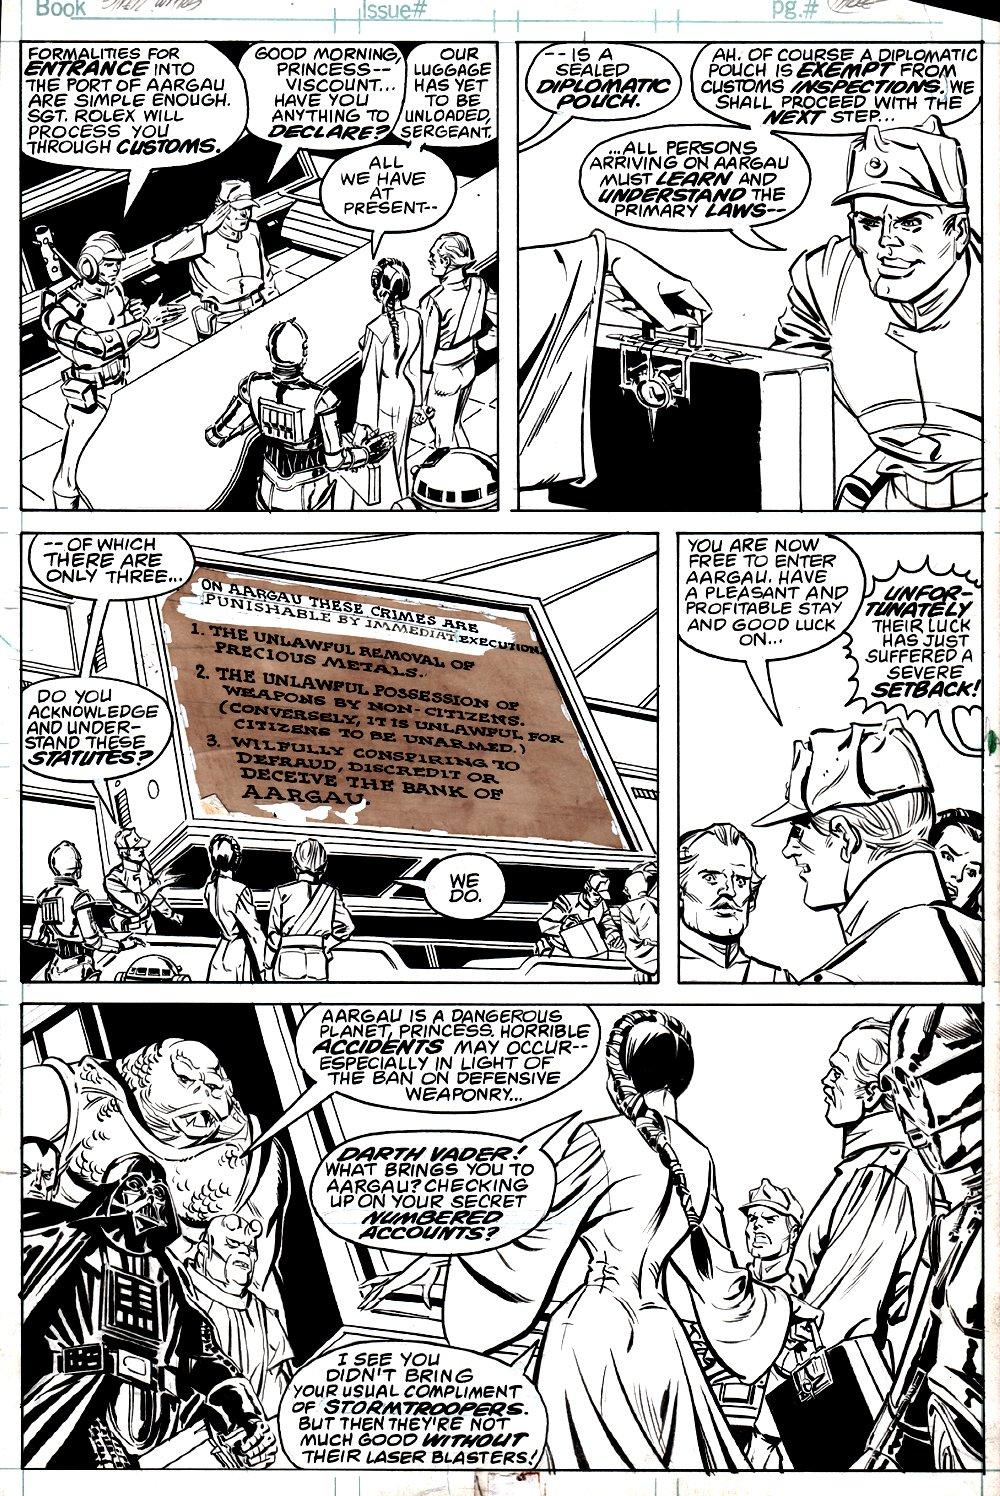 Star Wars #48 p 3 (Darth Vader VS Leia, C3PO) 1981